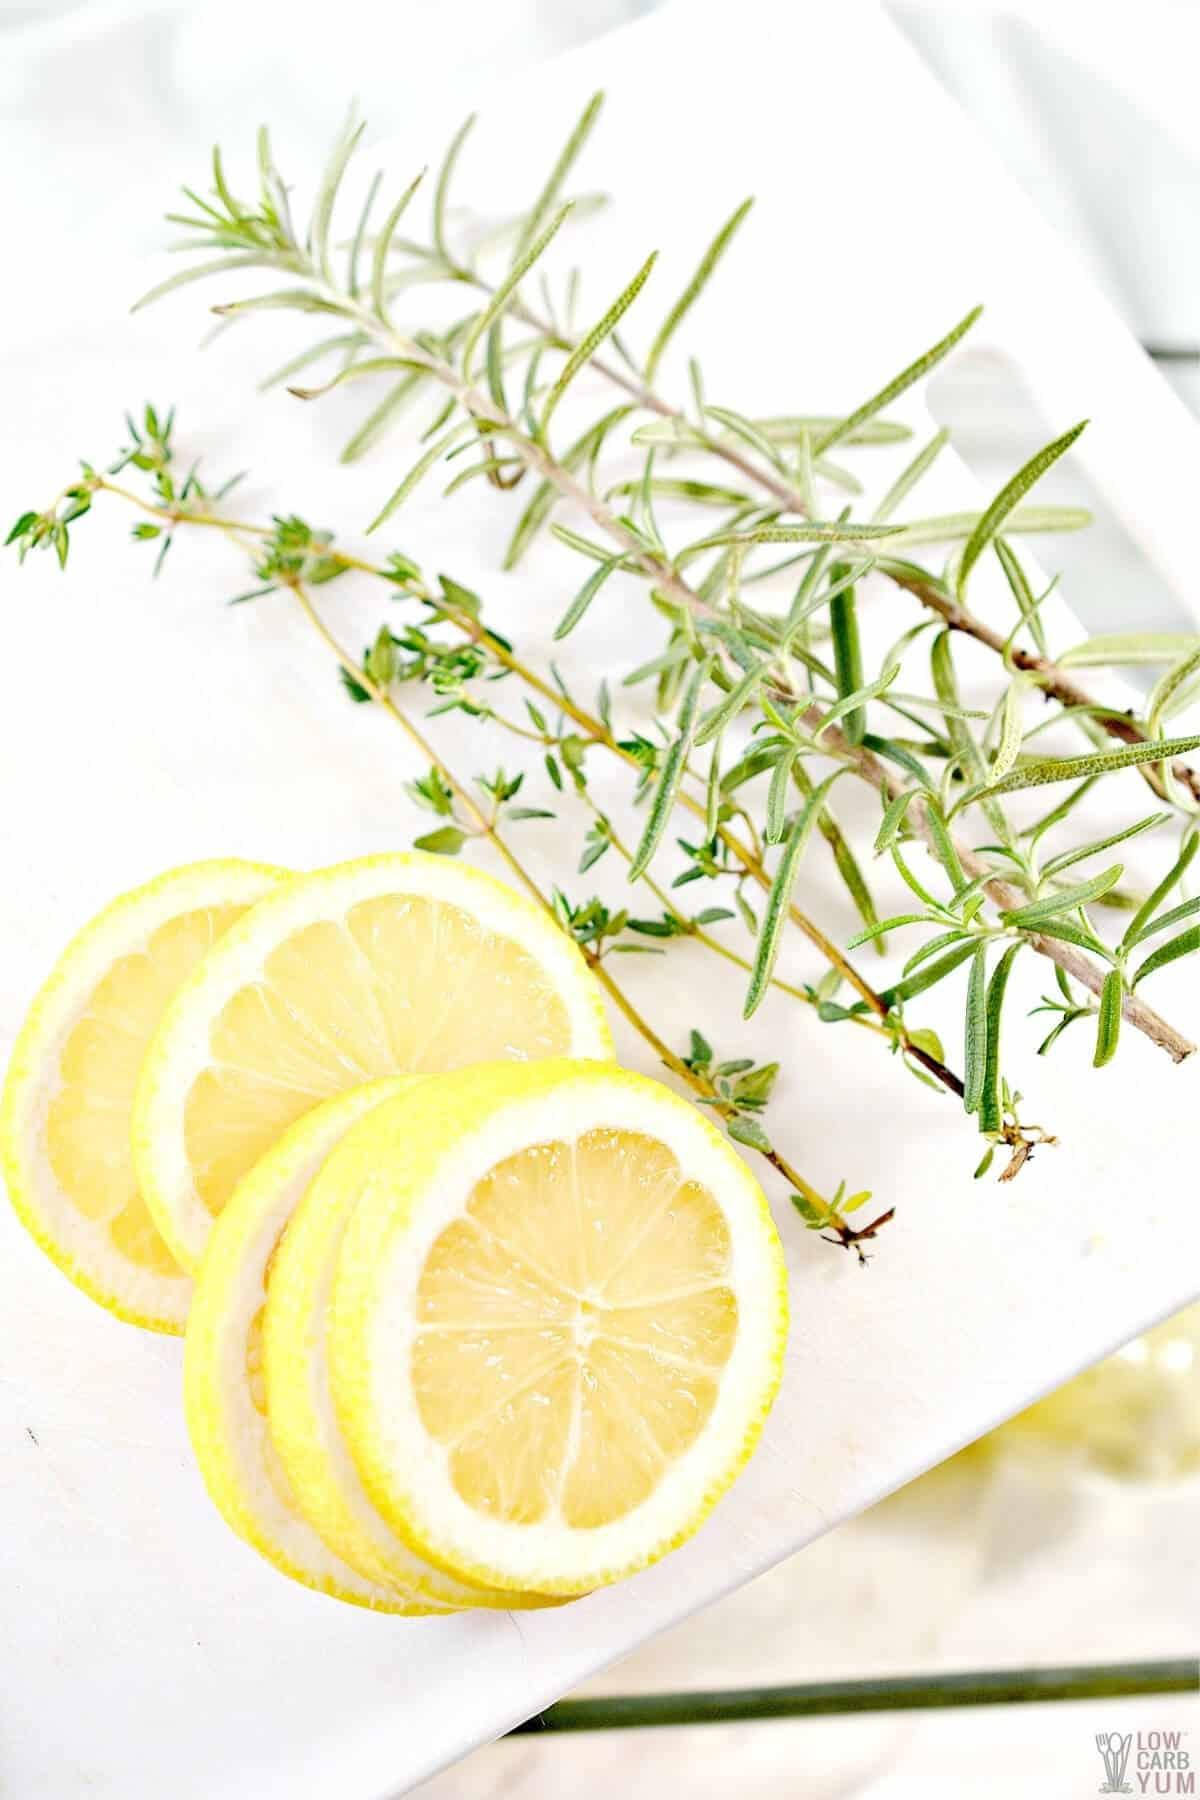 sliced lemon, rosemary, and thyme spigs on plate